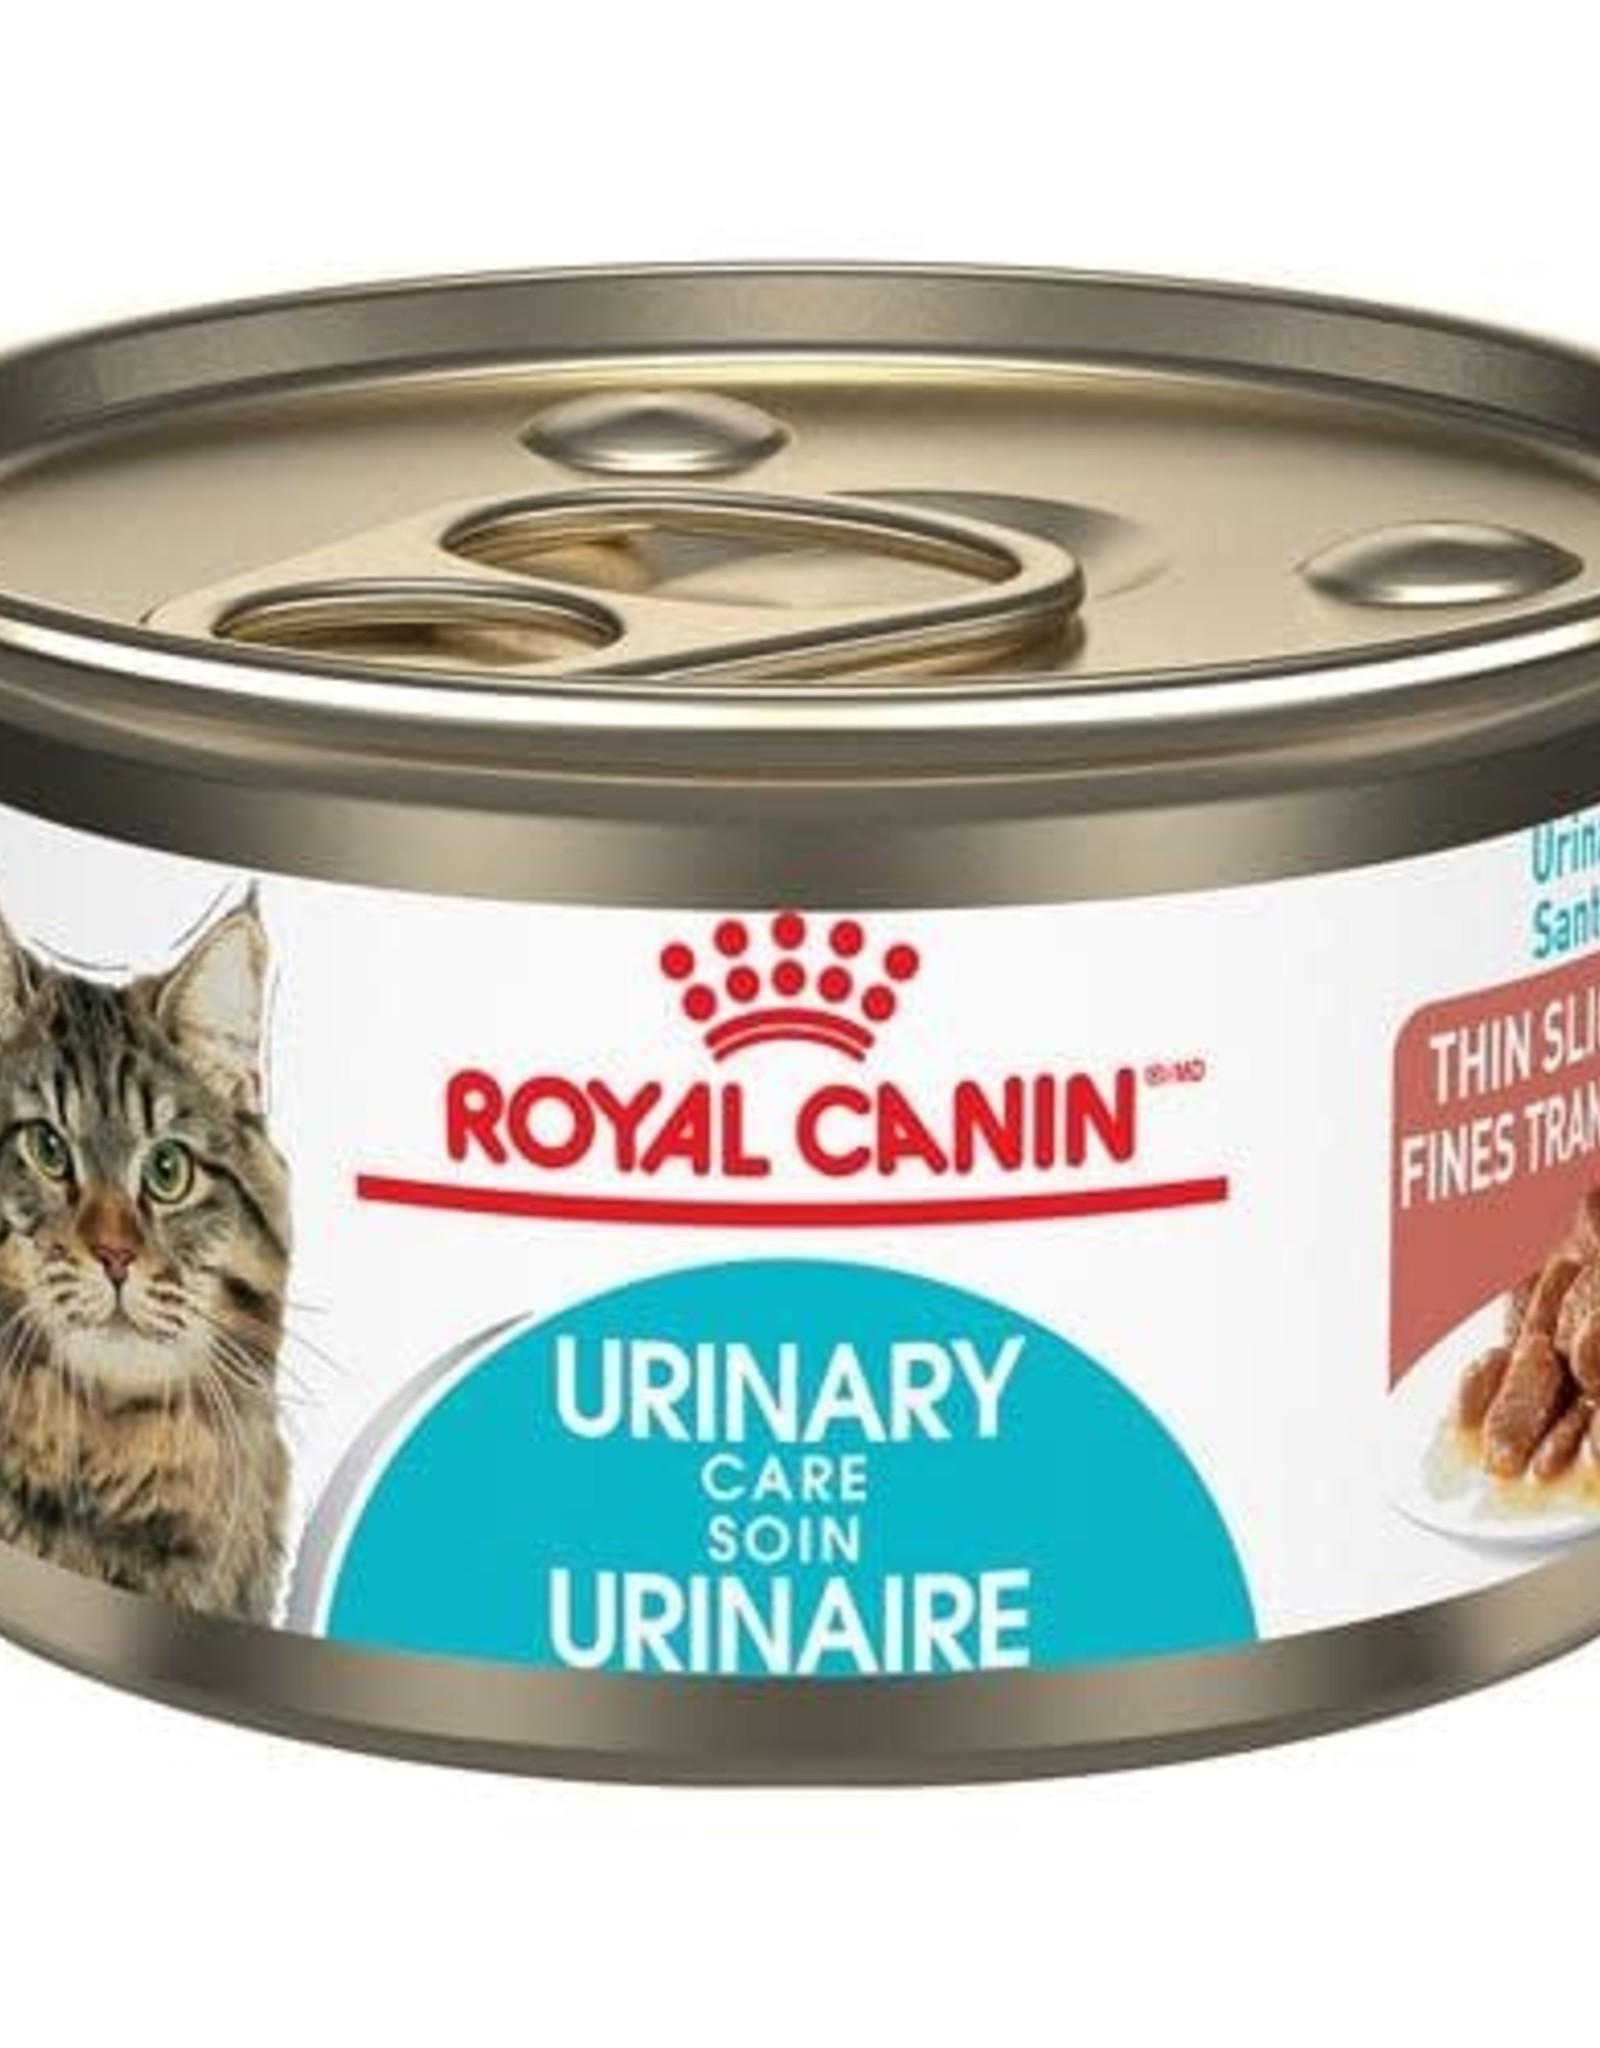 Royal Canin Royal Canin 3oz urinary care